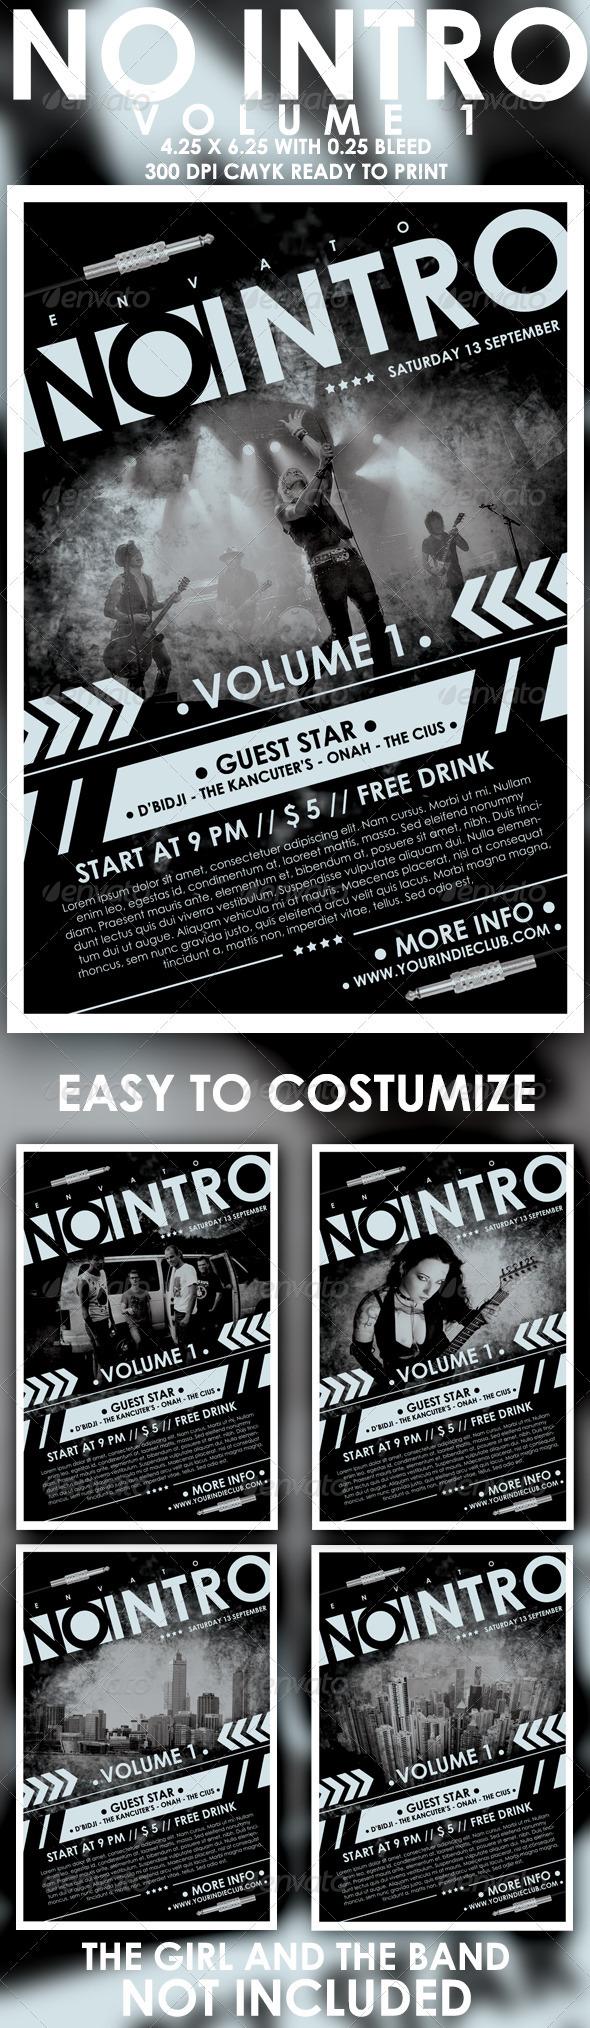 GraphicRiver No Intro Vol 1 Flyer Template 3902191